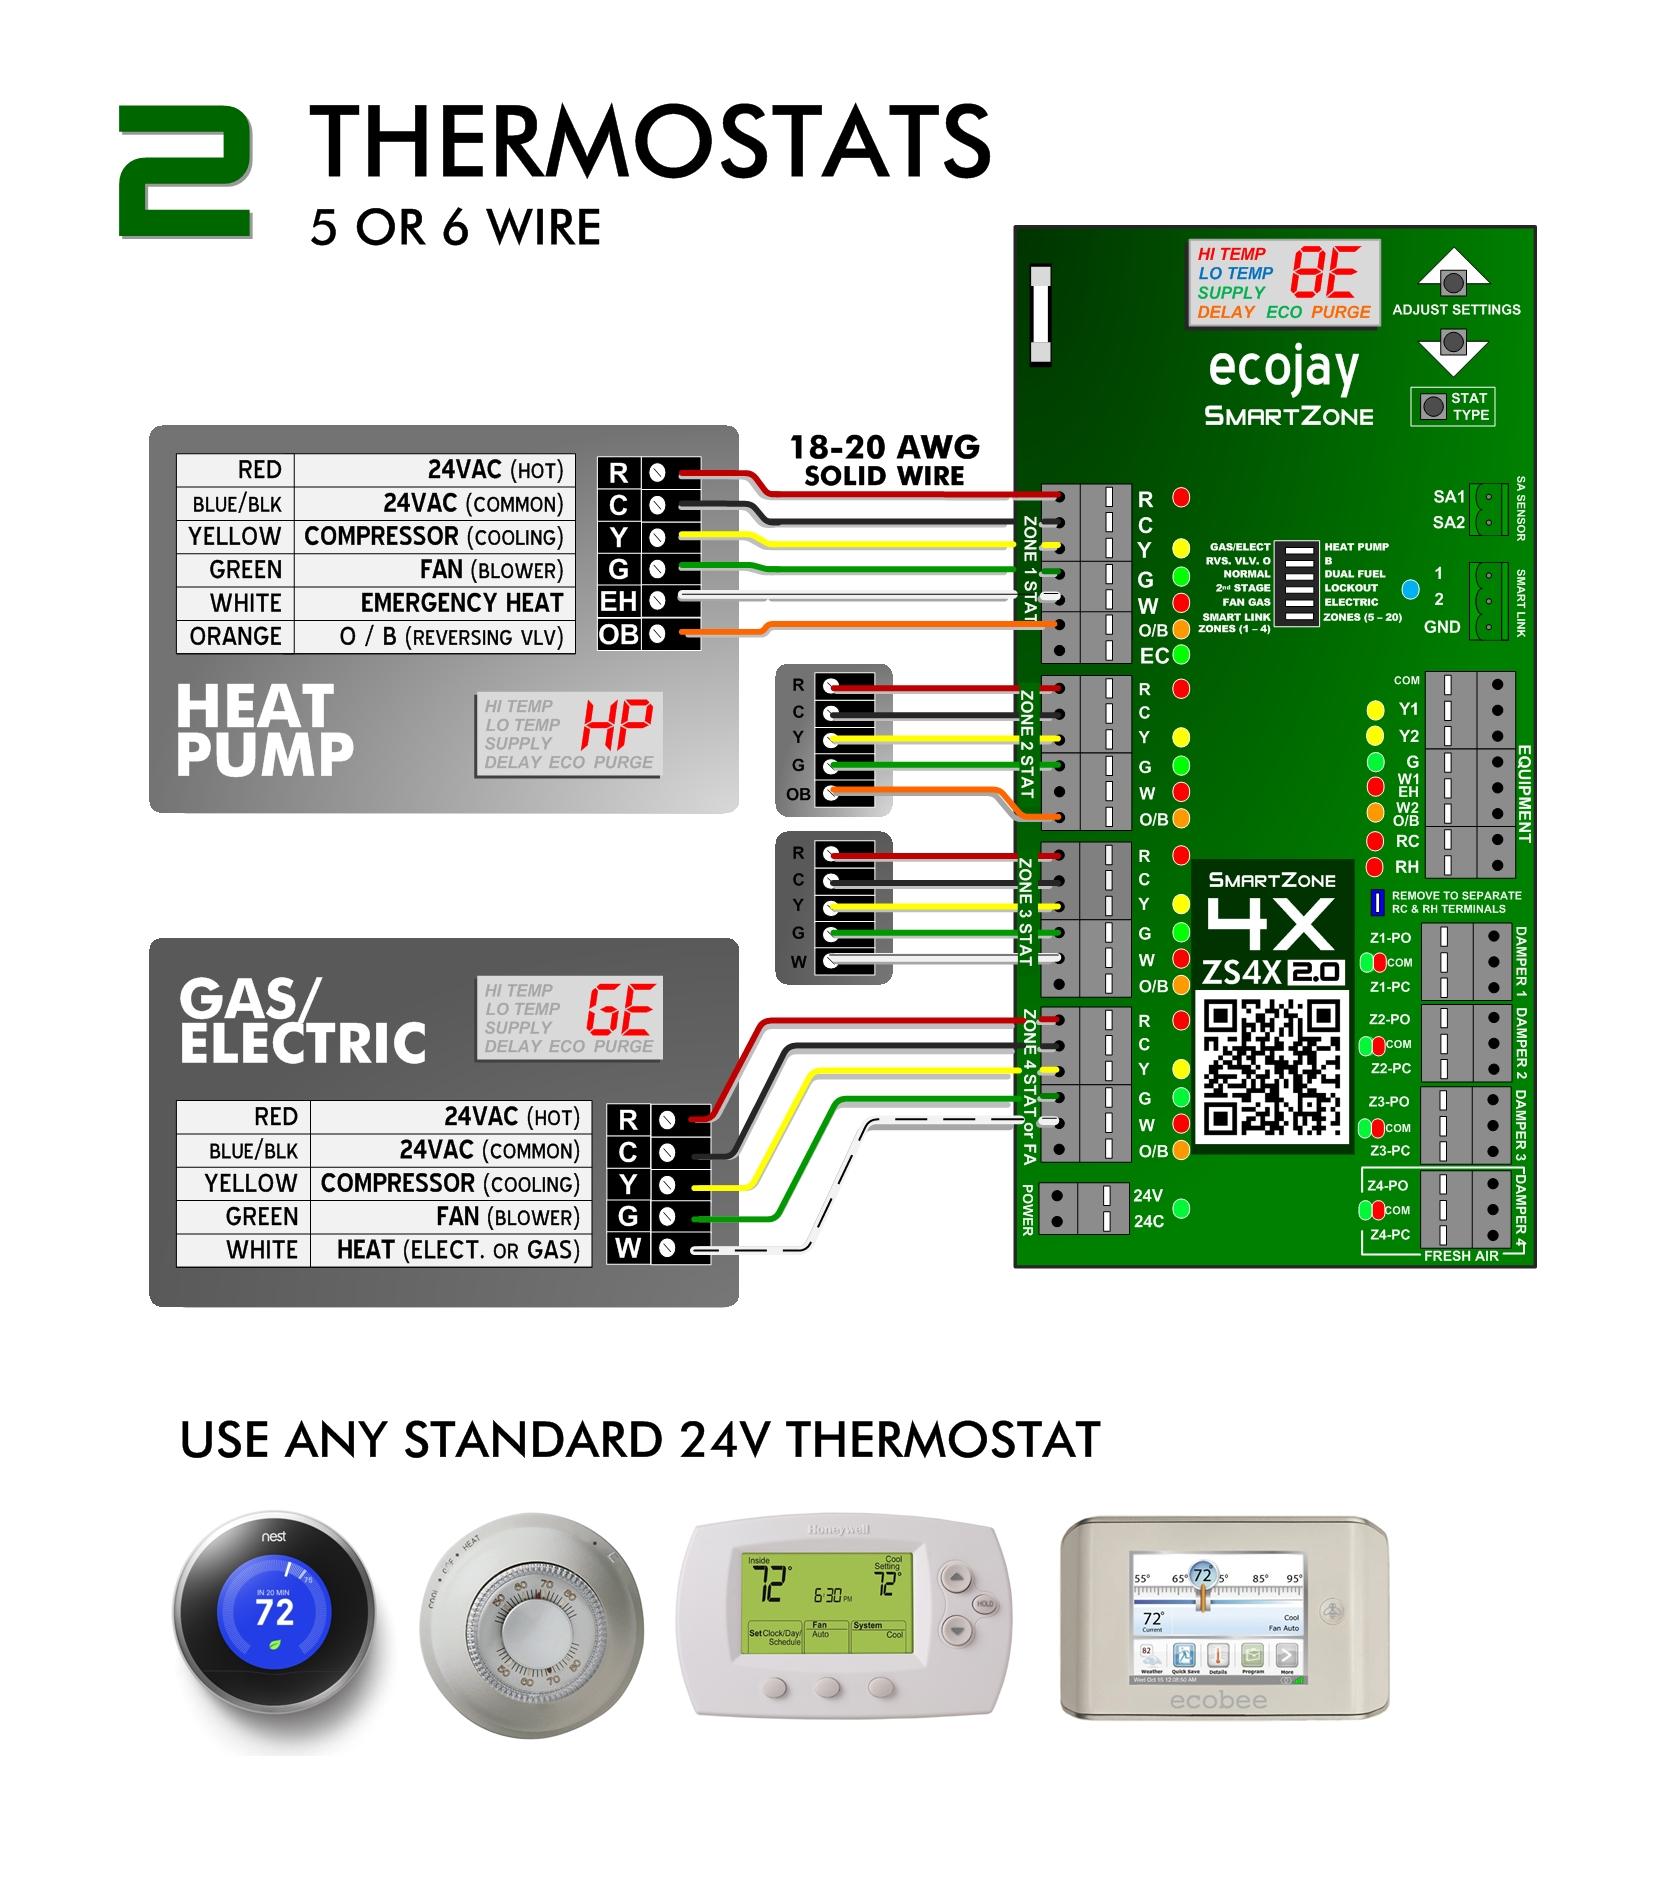 smartzone thermostat install [ 1675 x 1900 Pixel ]